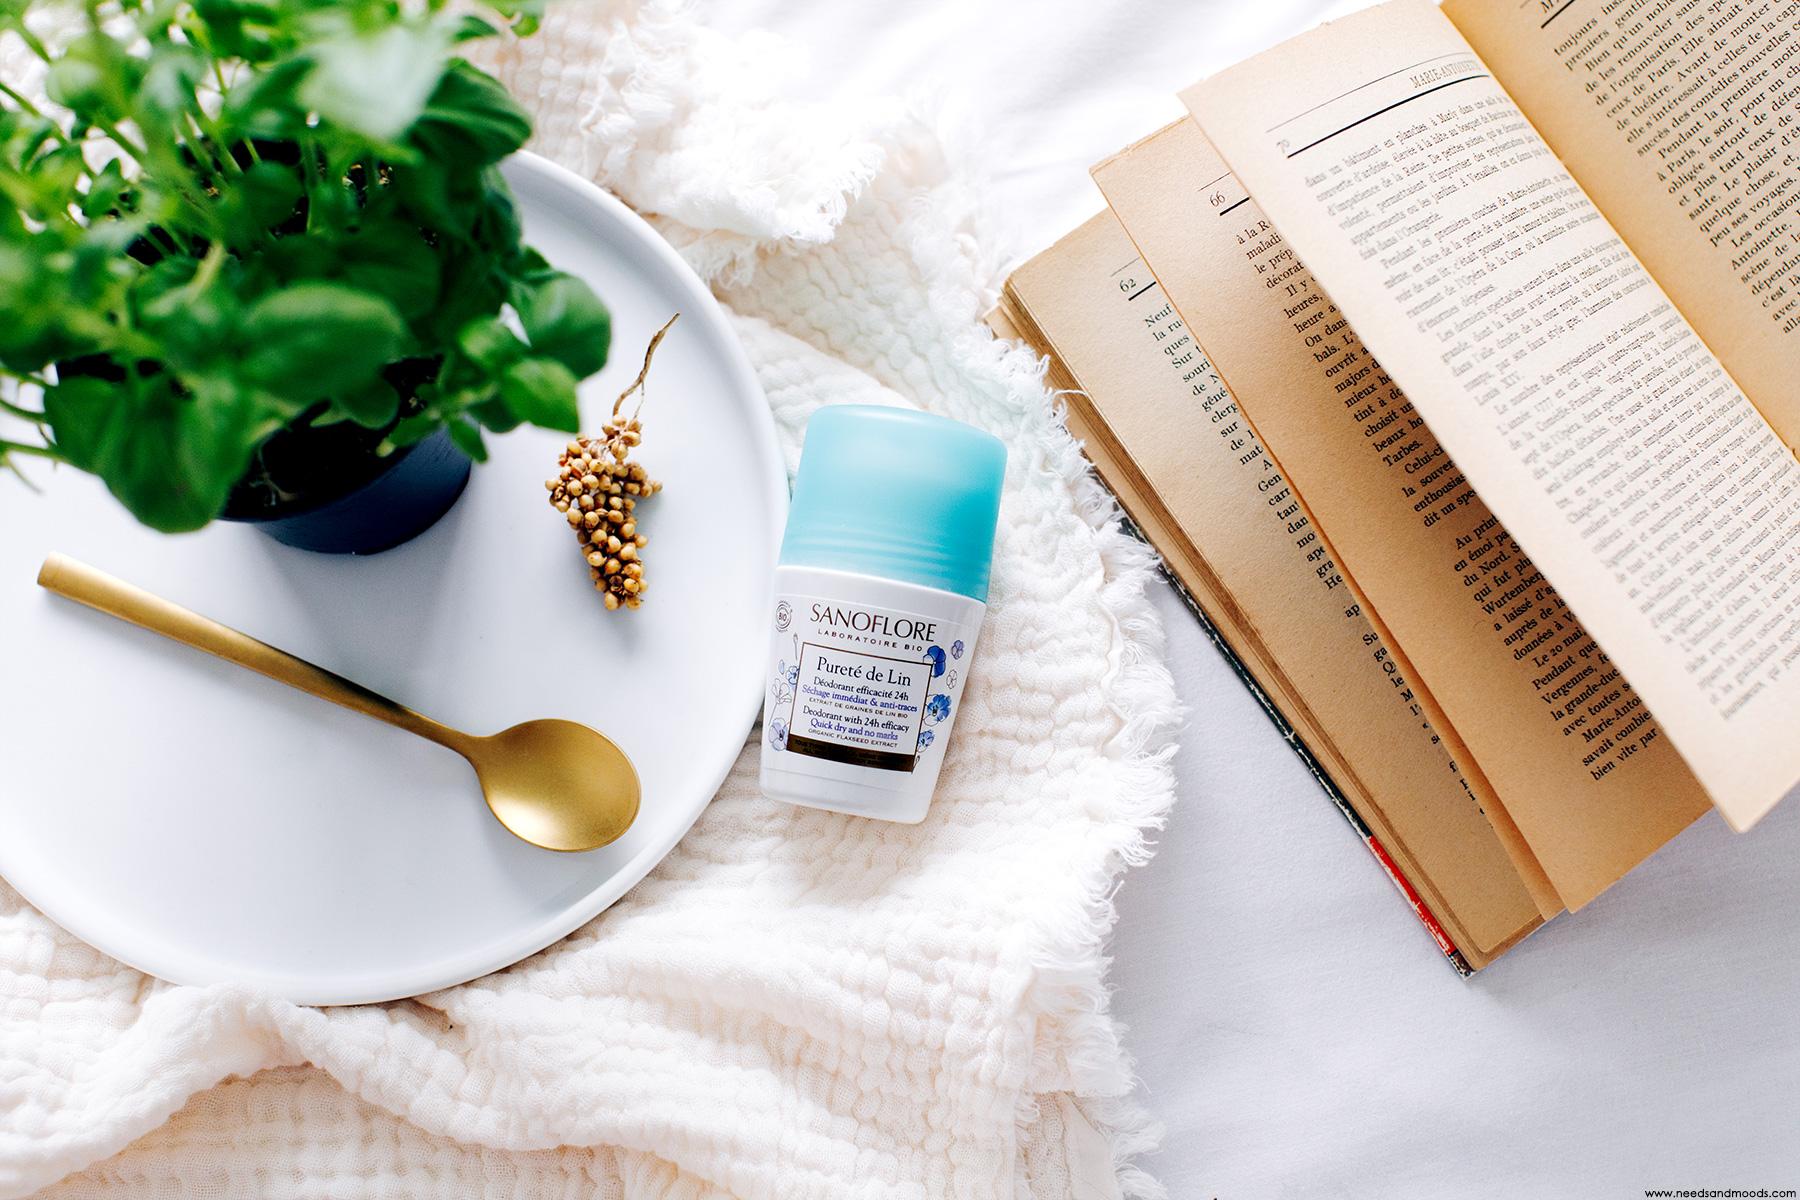 sanoflore deodorant purete de lin avis